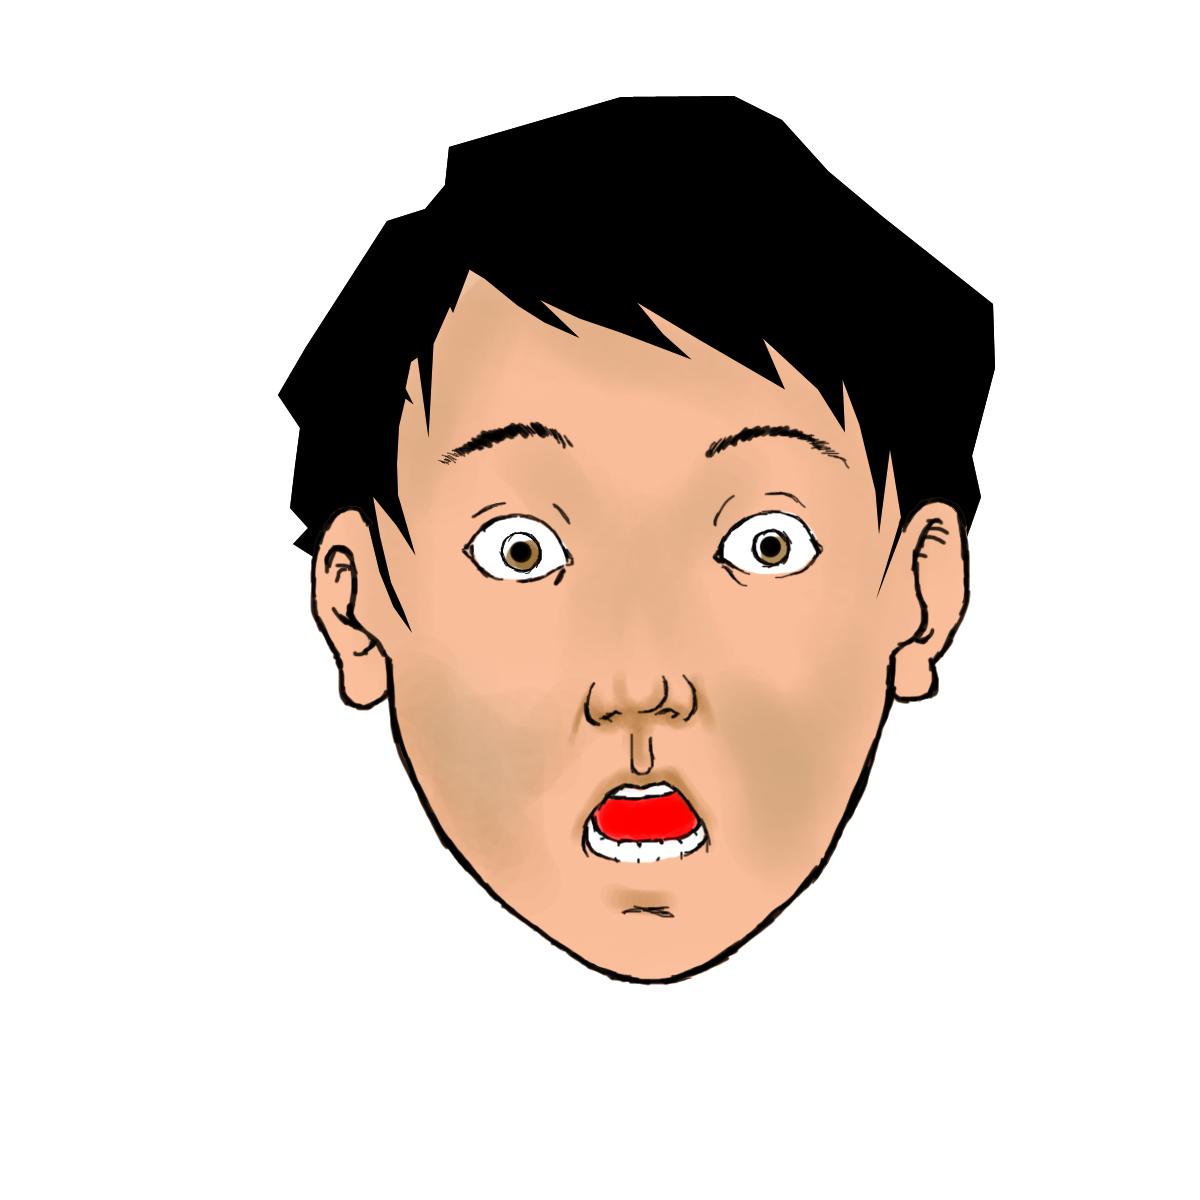 Shocked Face Cartoon - Cliparts.co